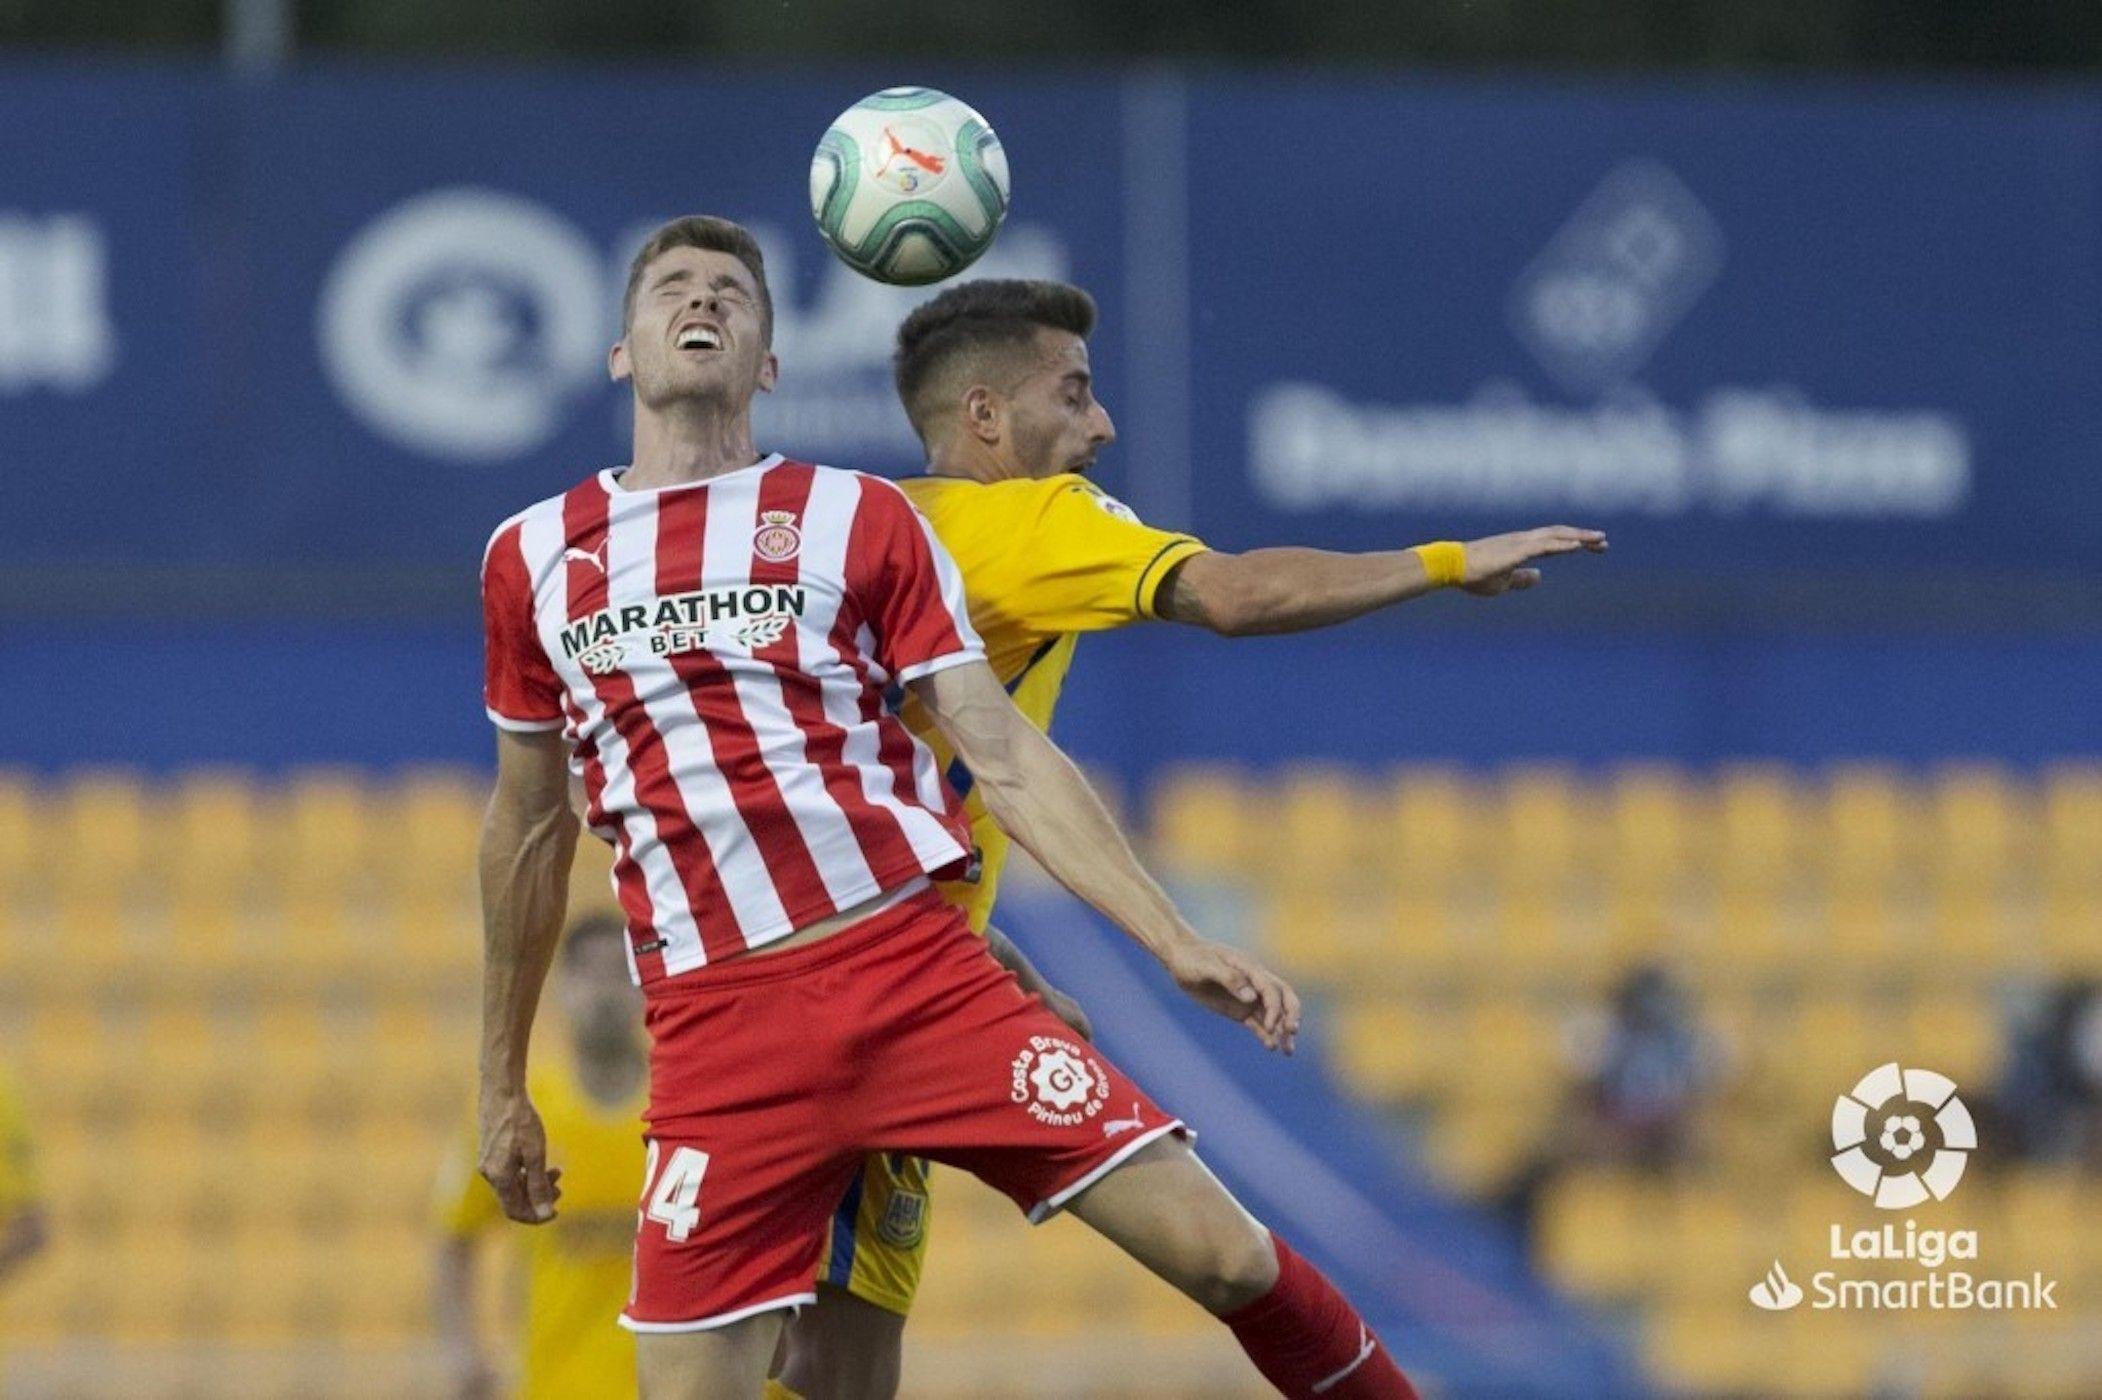 Gumbau, durant el partit contra l'Alcorcón | Girona FC